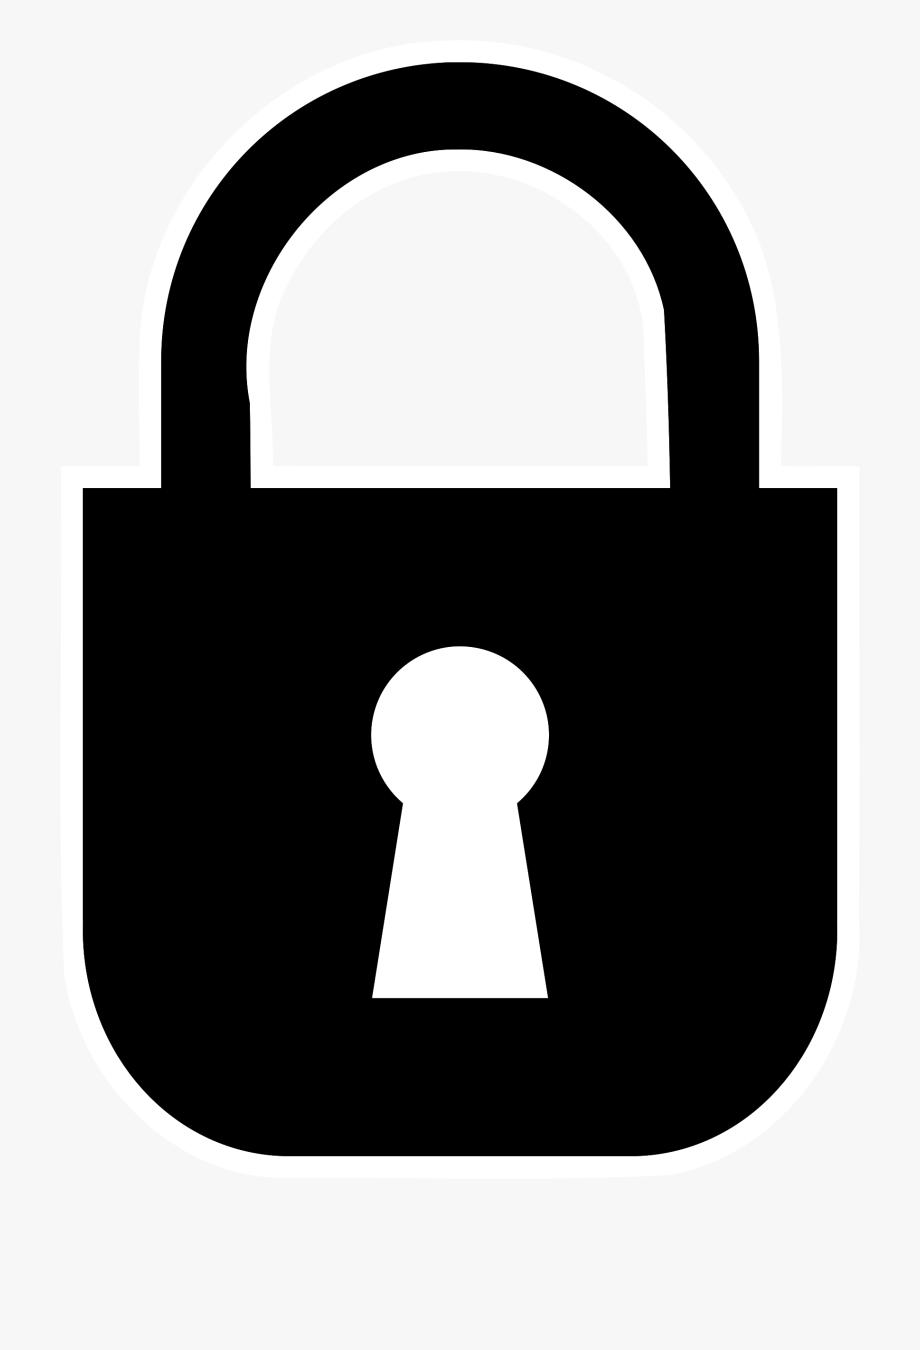 Lock clipart transparent. Padlock monochrome